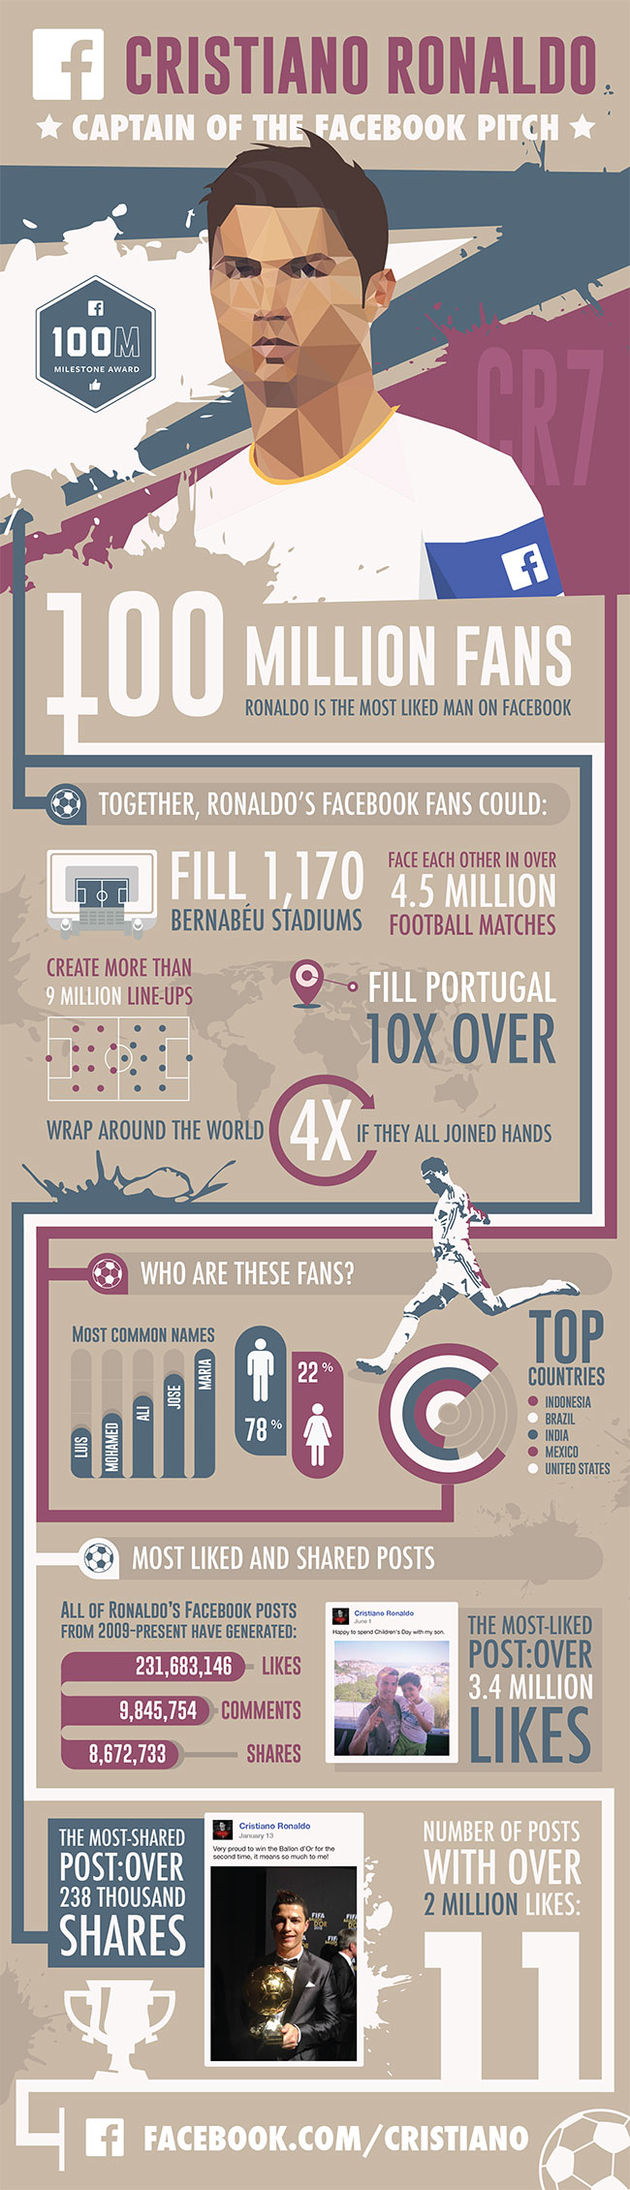 Cristiano_Ronaldo_Infographic_facebook